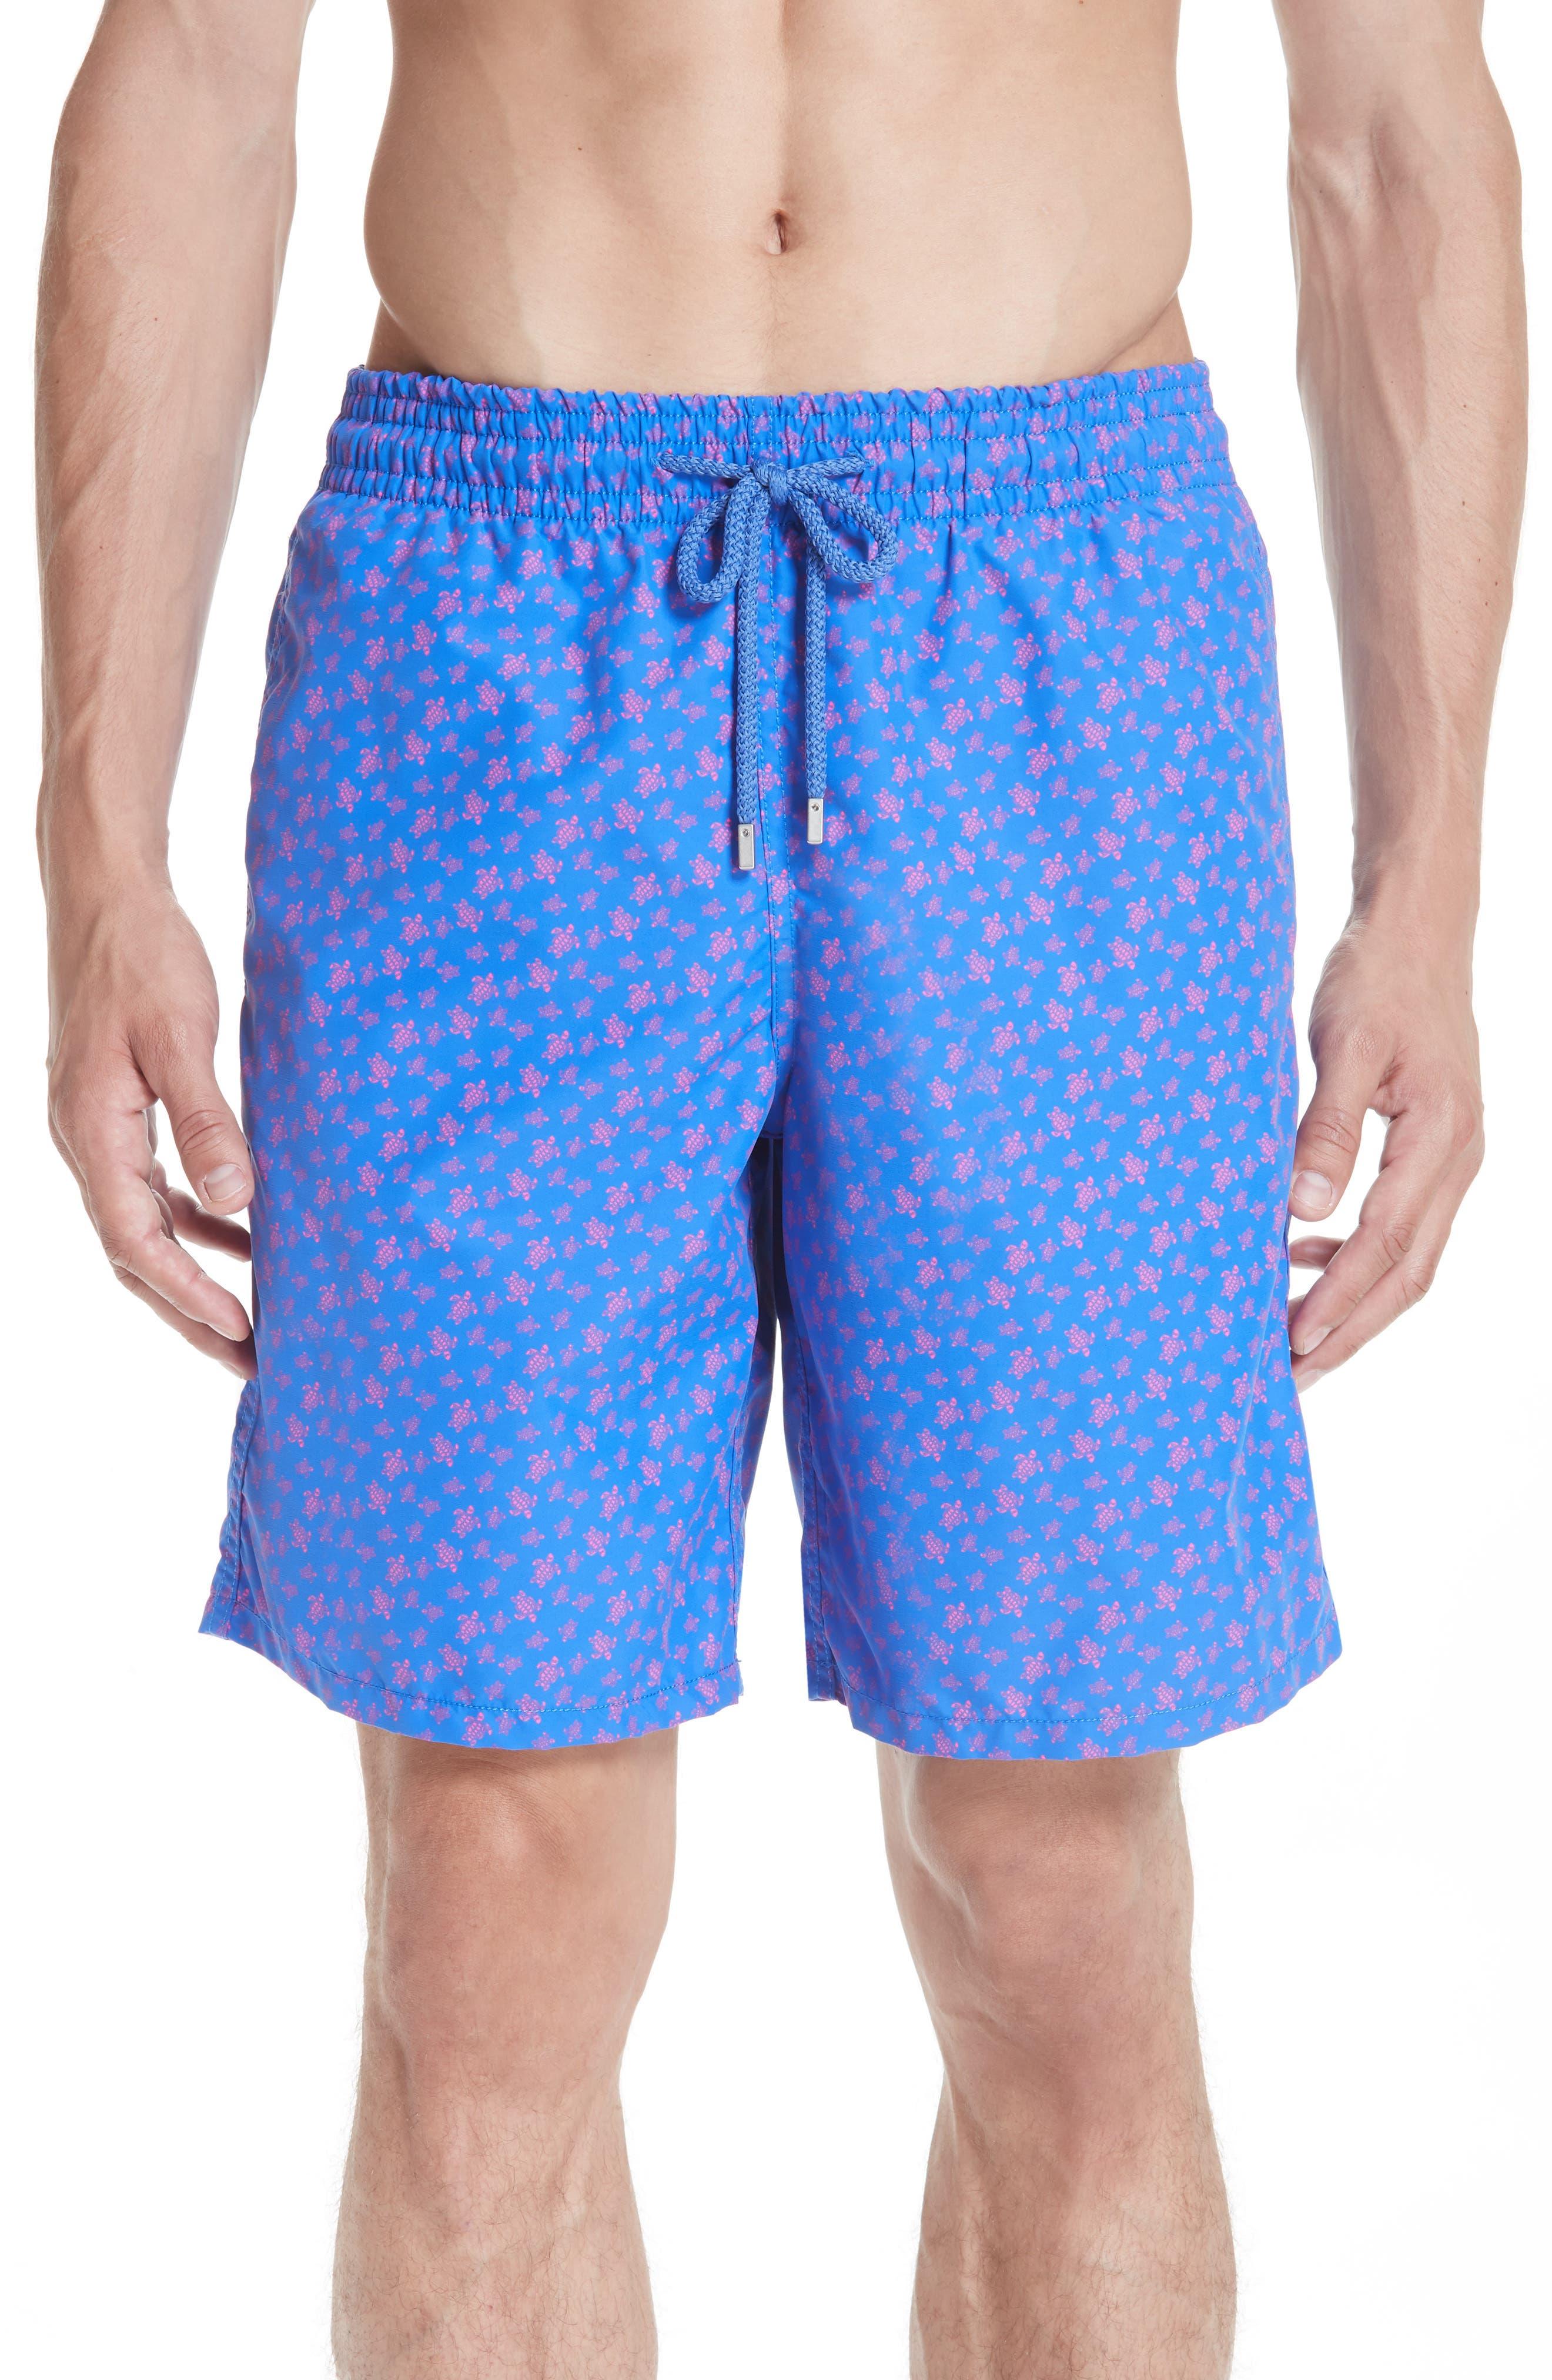 VILEBREQUIN Micro Ronde Turtle Print Swim Trunks, Main, color, BLUE